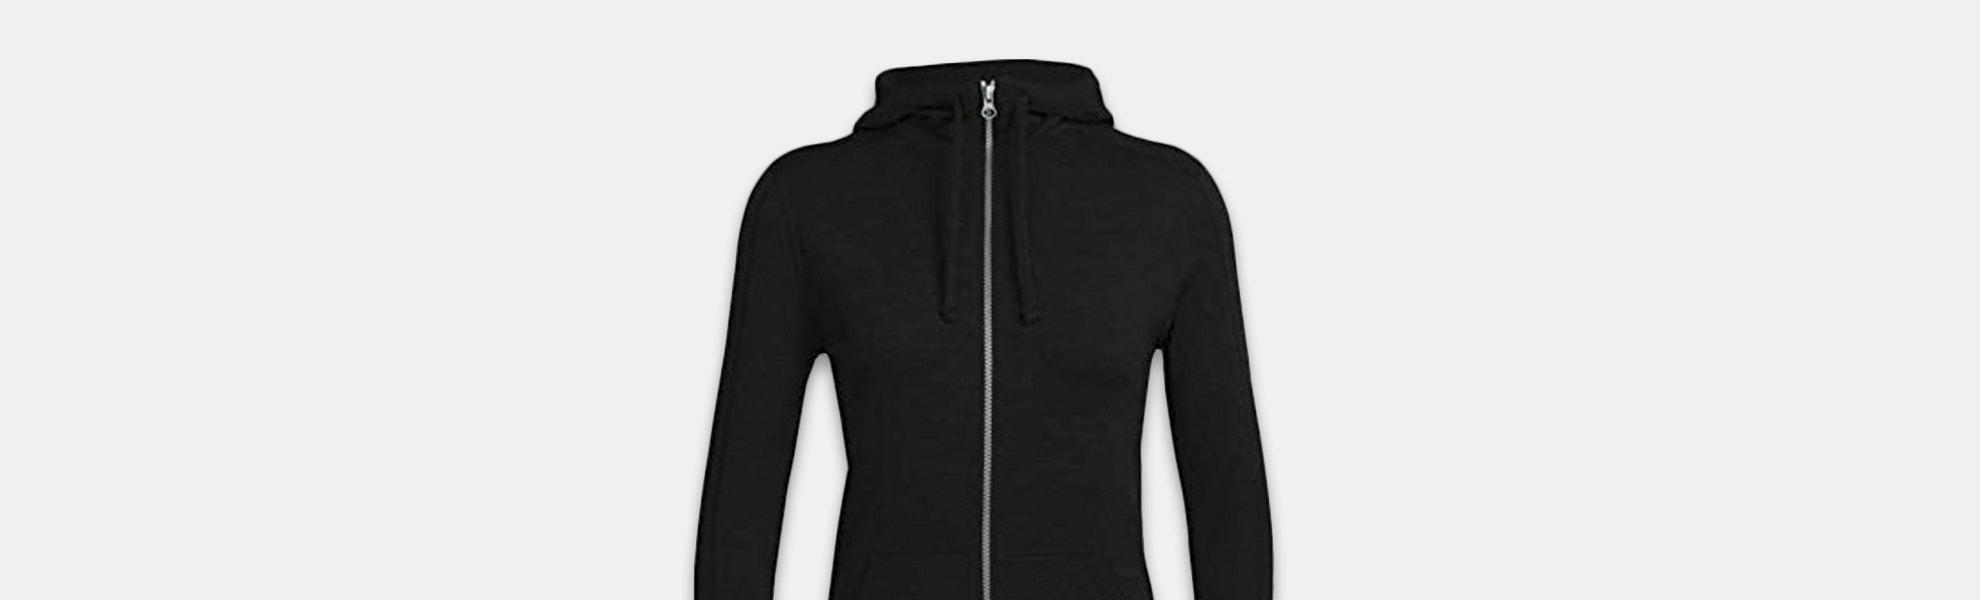 Icebreaker Dia Women's Long-Sleeve Hooded Jacket